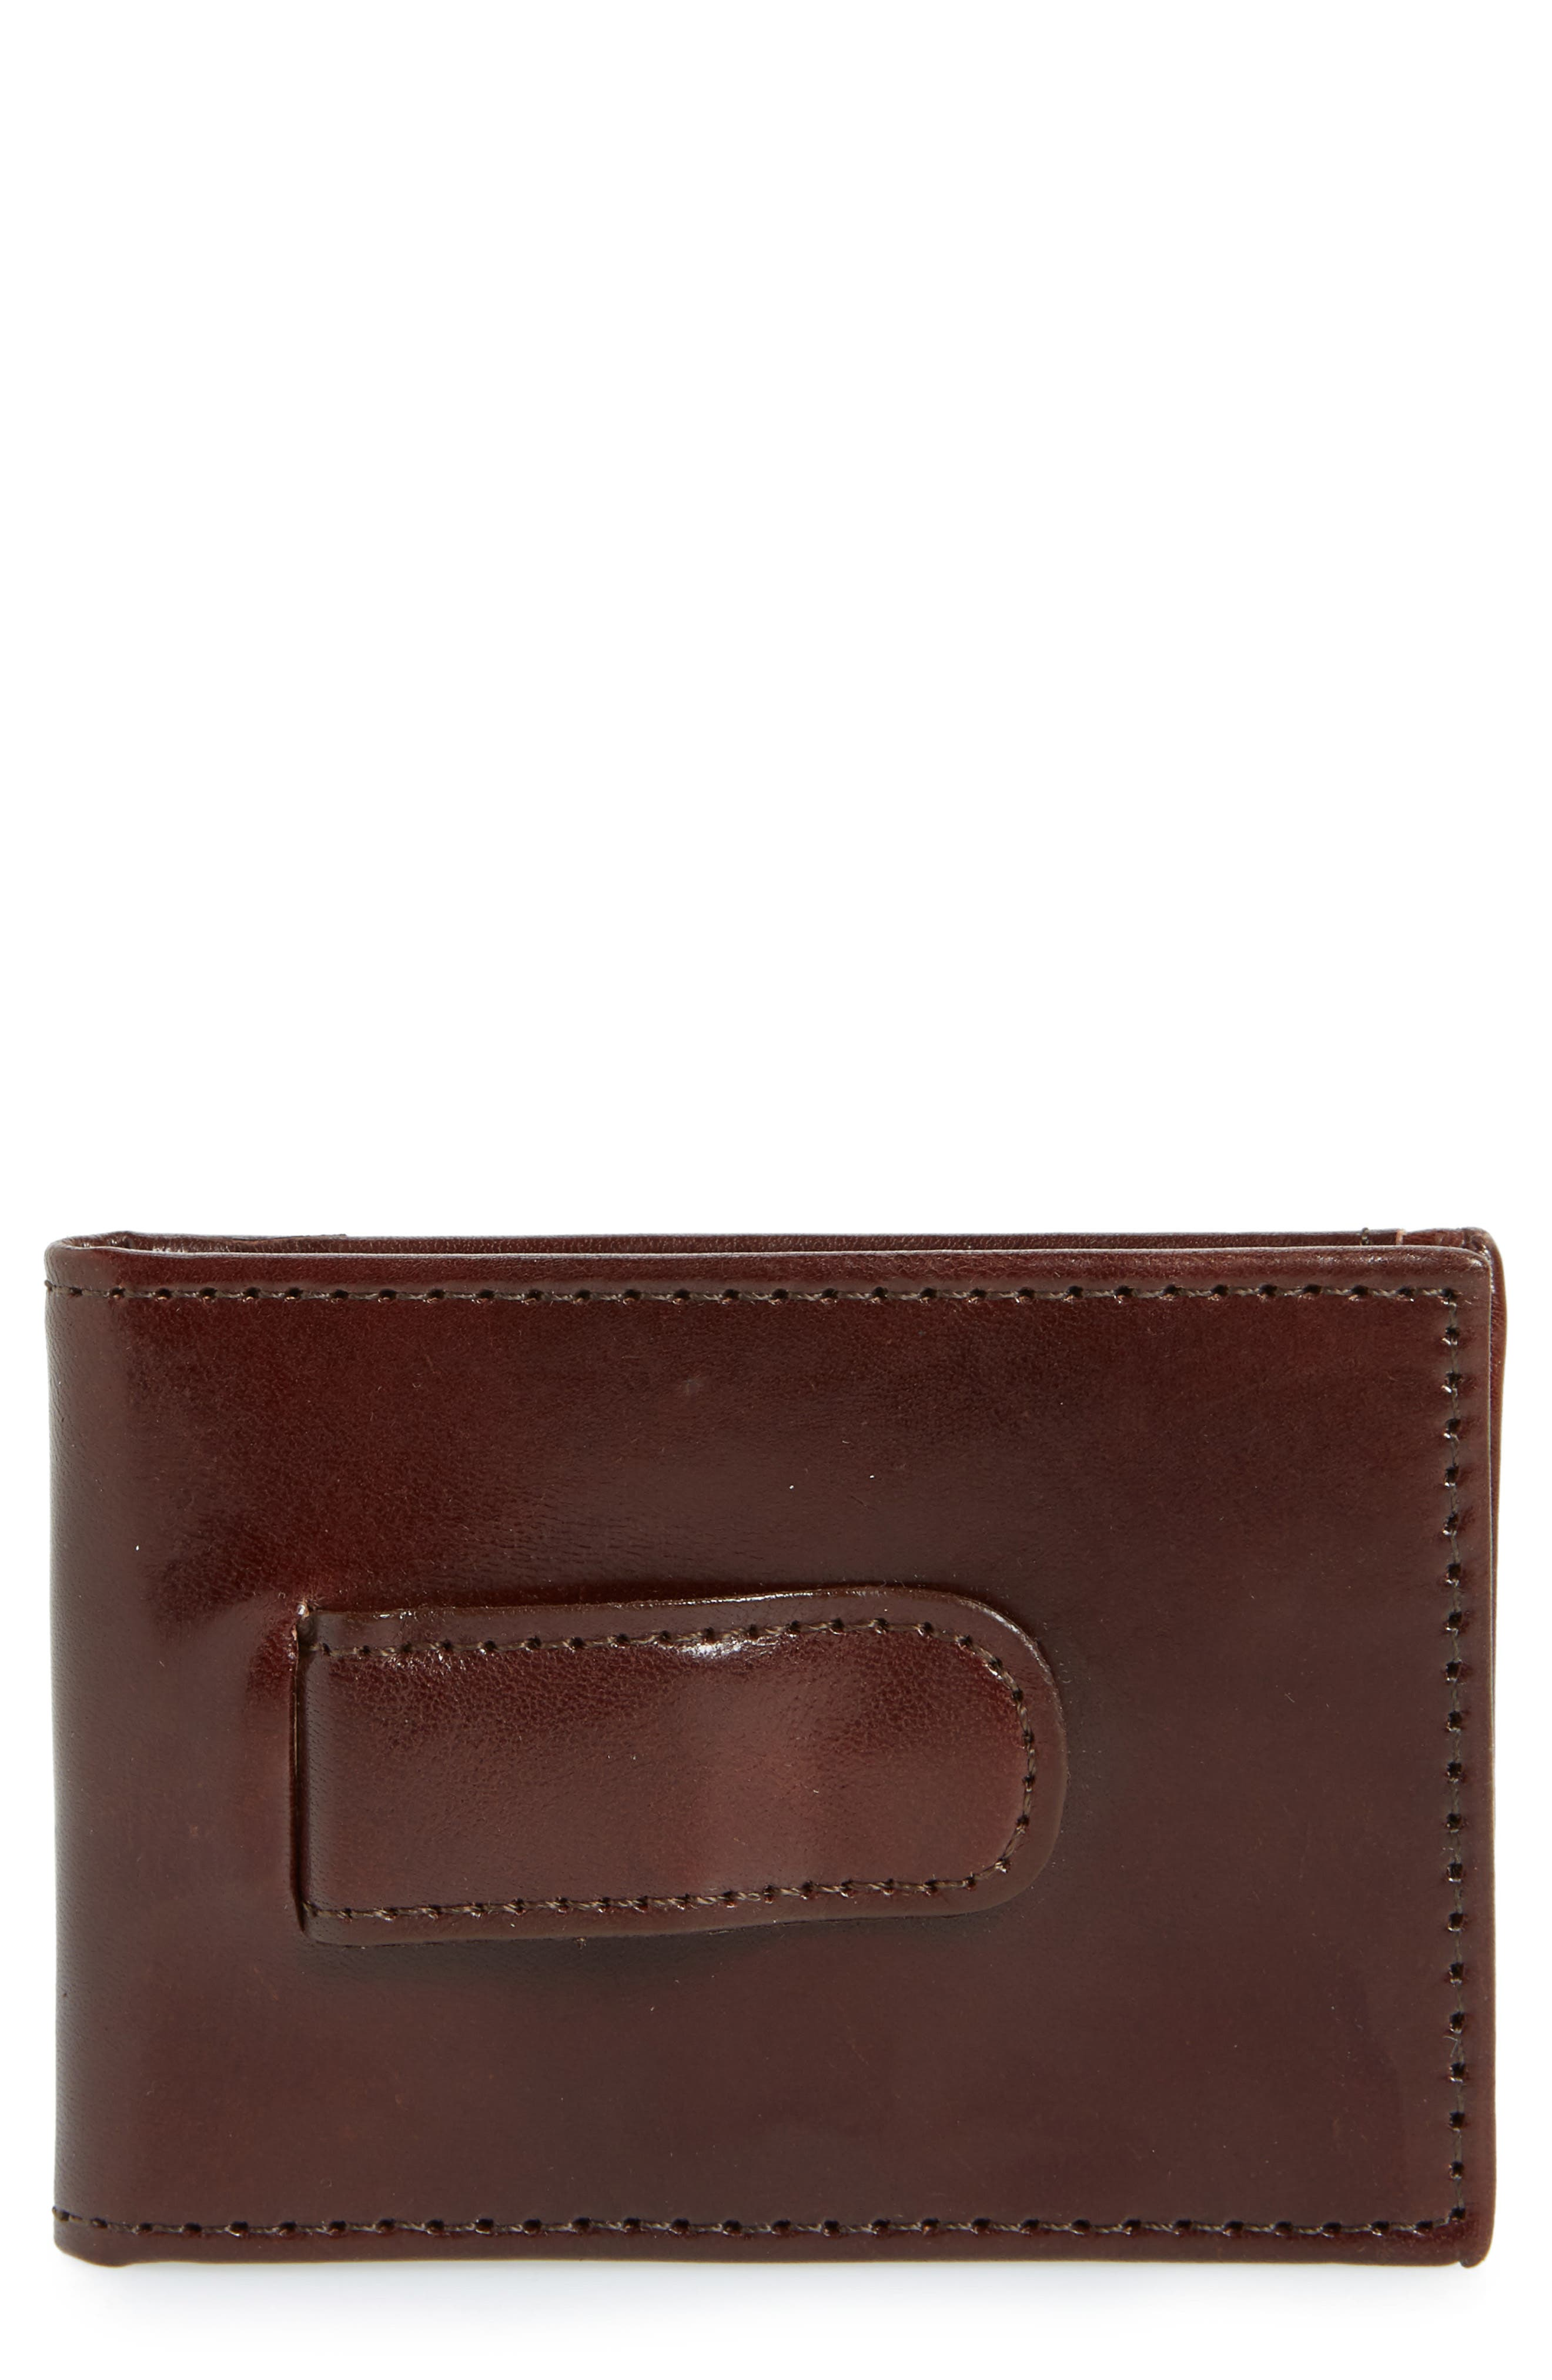 Leather Money Clip Wallet,                         Main,                         color, BROWN